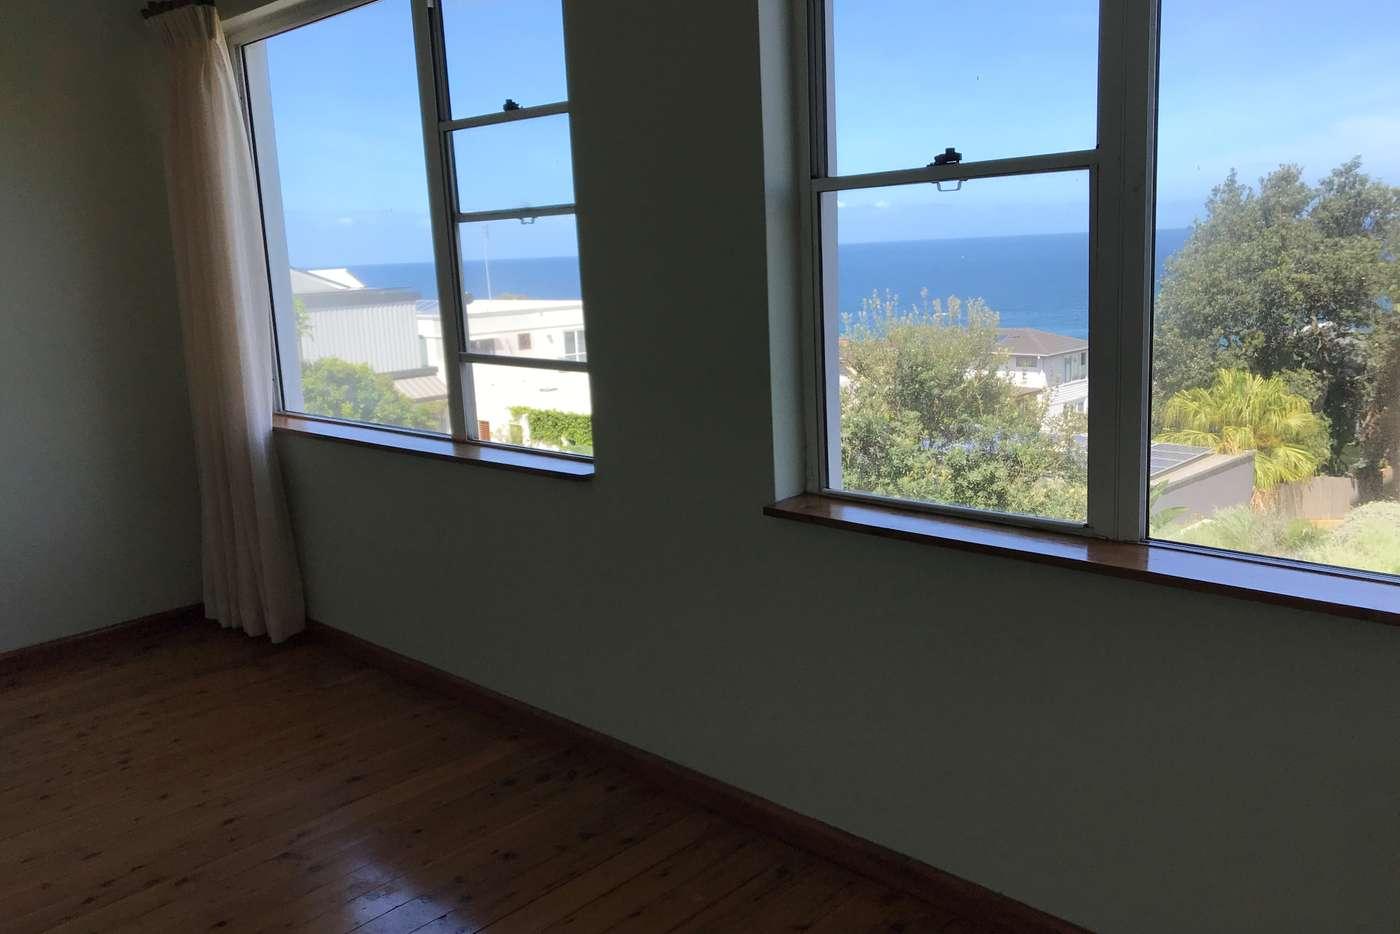 Sixth view of Homely apartment listing, 1/47 Fletcher Street, Tamarama NSW 2026